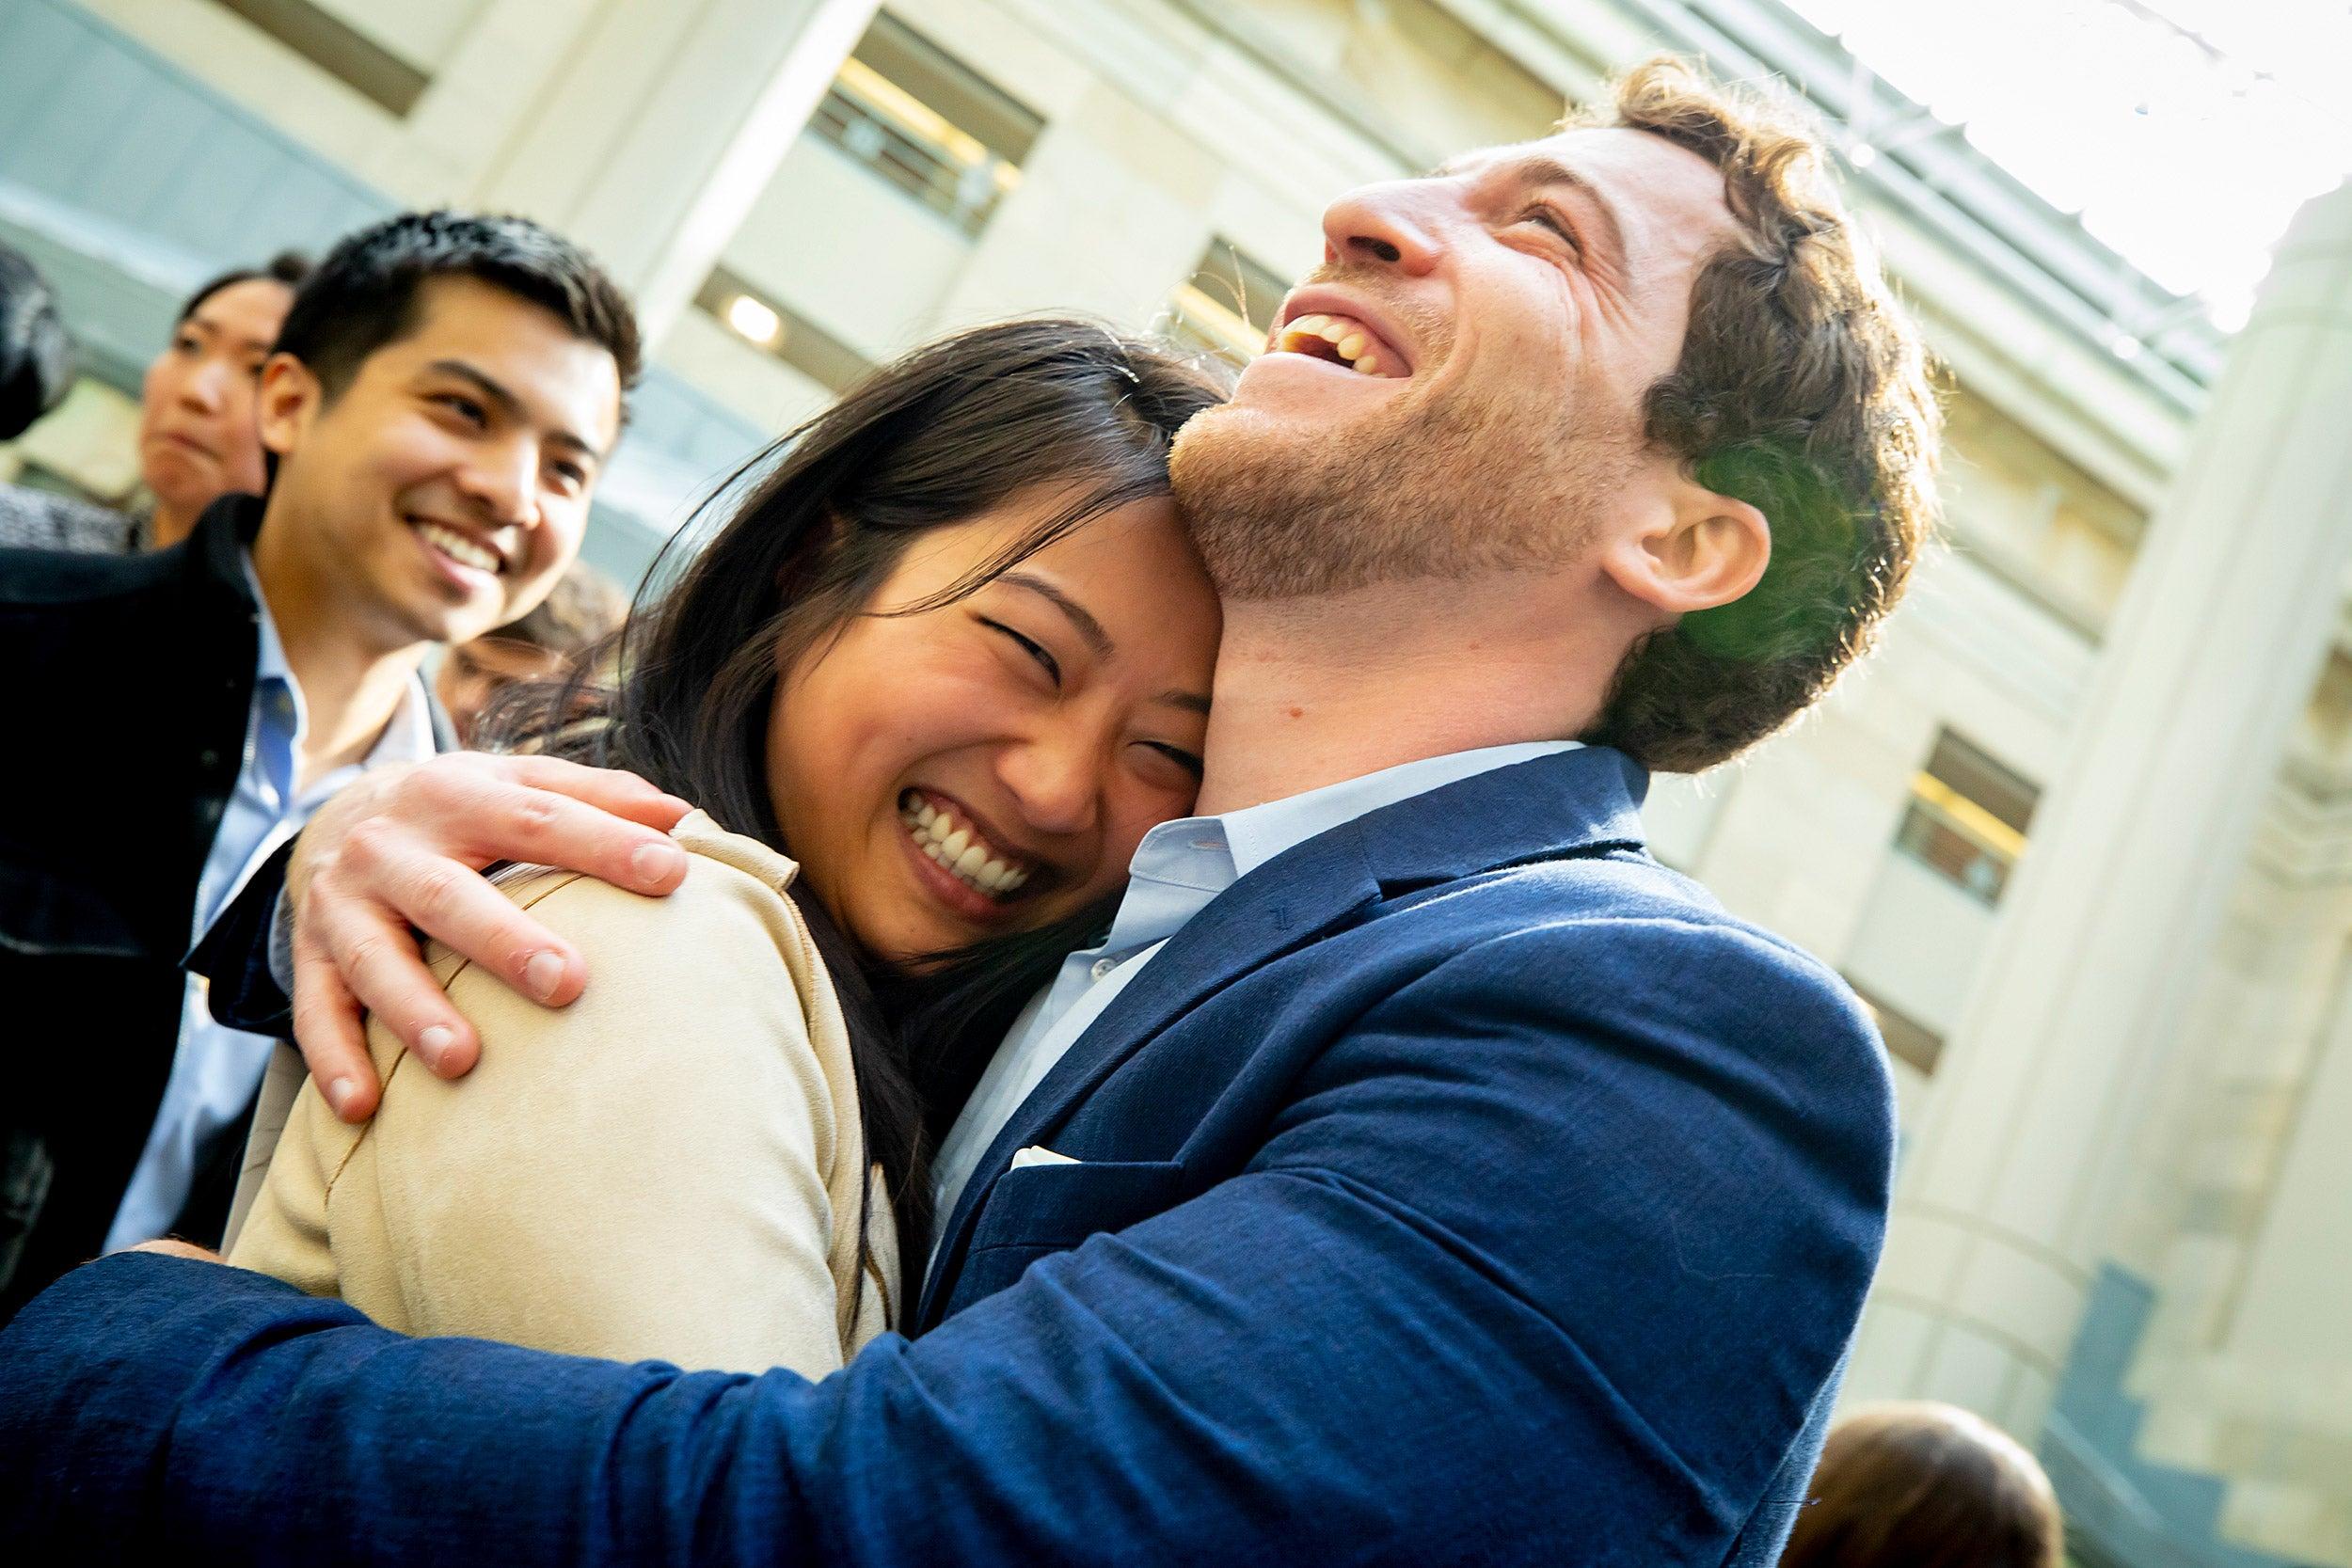 Diana Miao hugs a friend to celebrate residency.